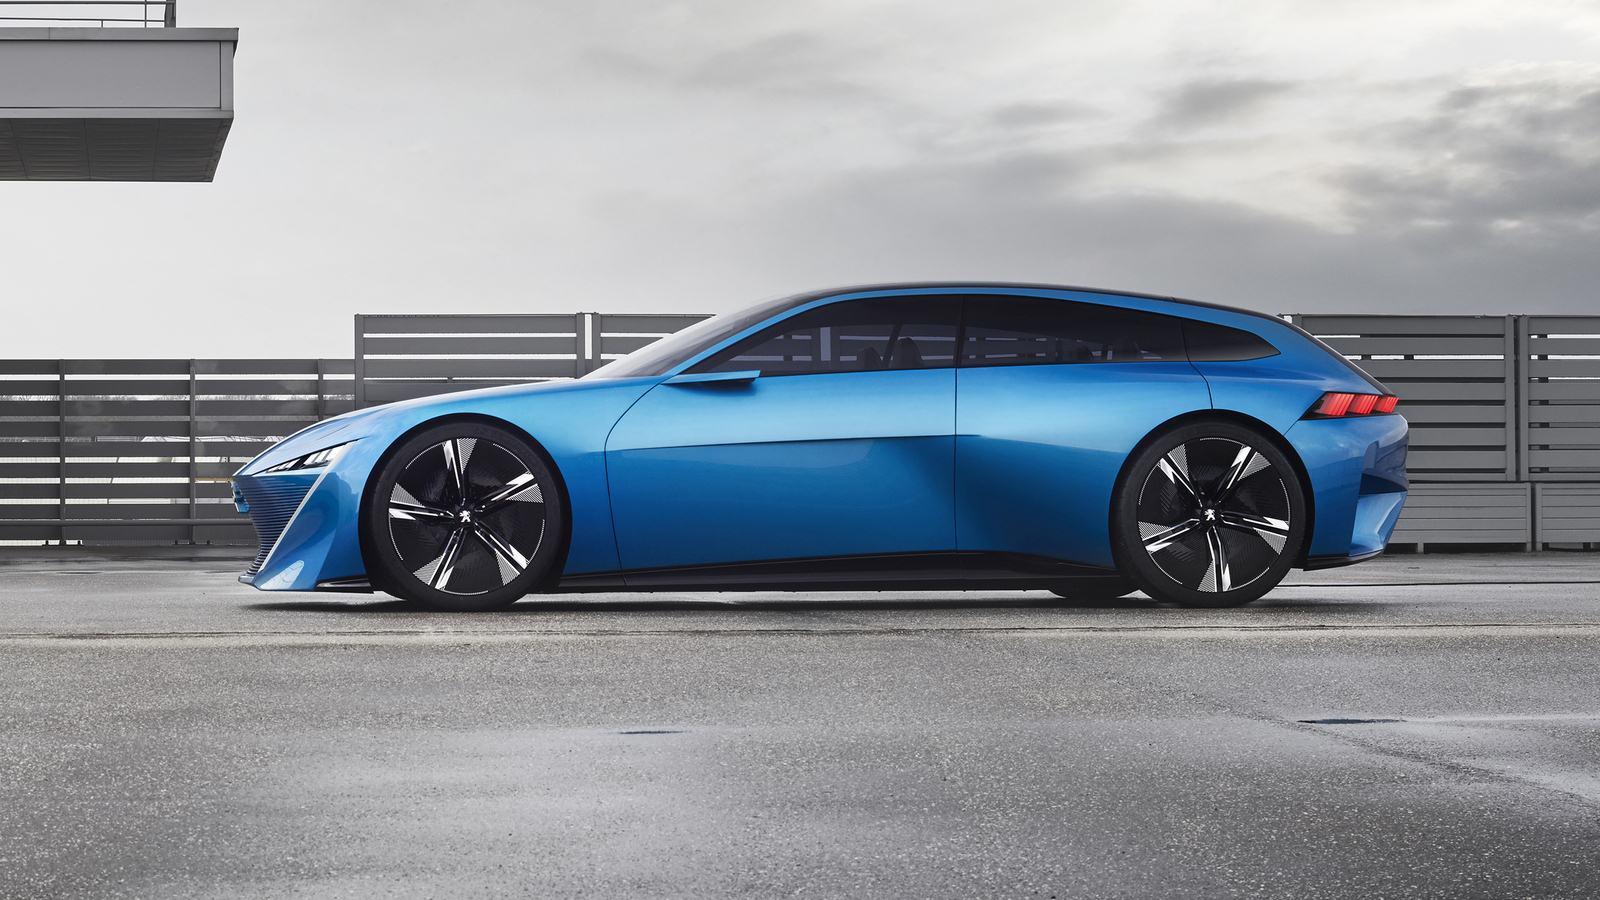 2017-Peugeot-Instinct-Concept-13